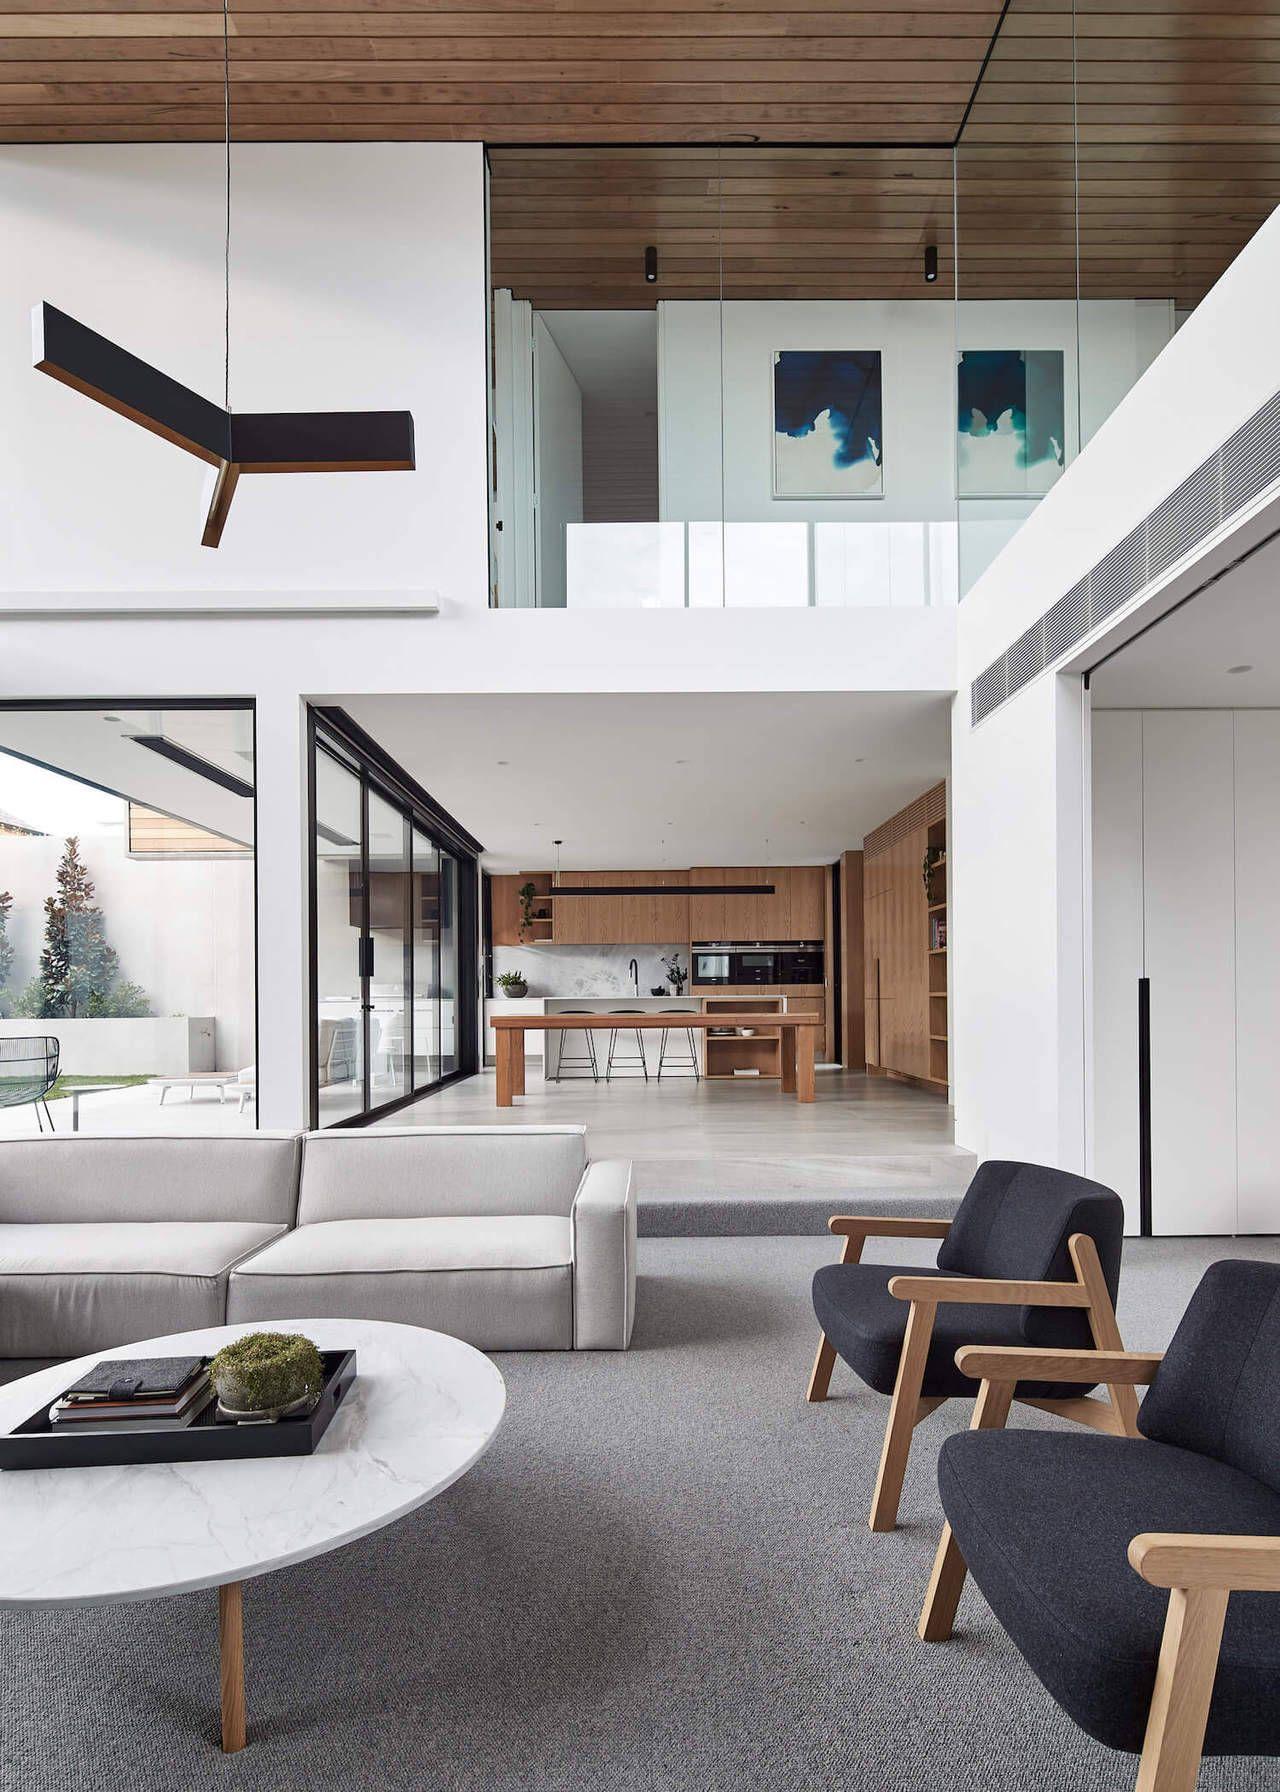 housing and interior design quizlet concepts